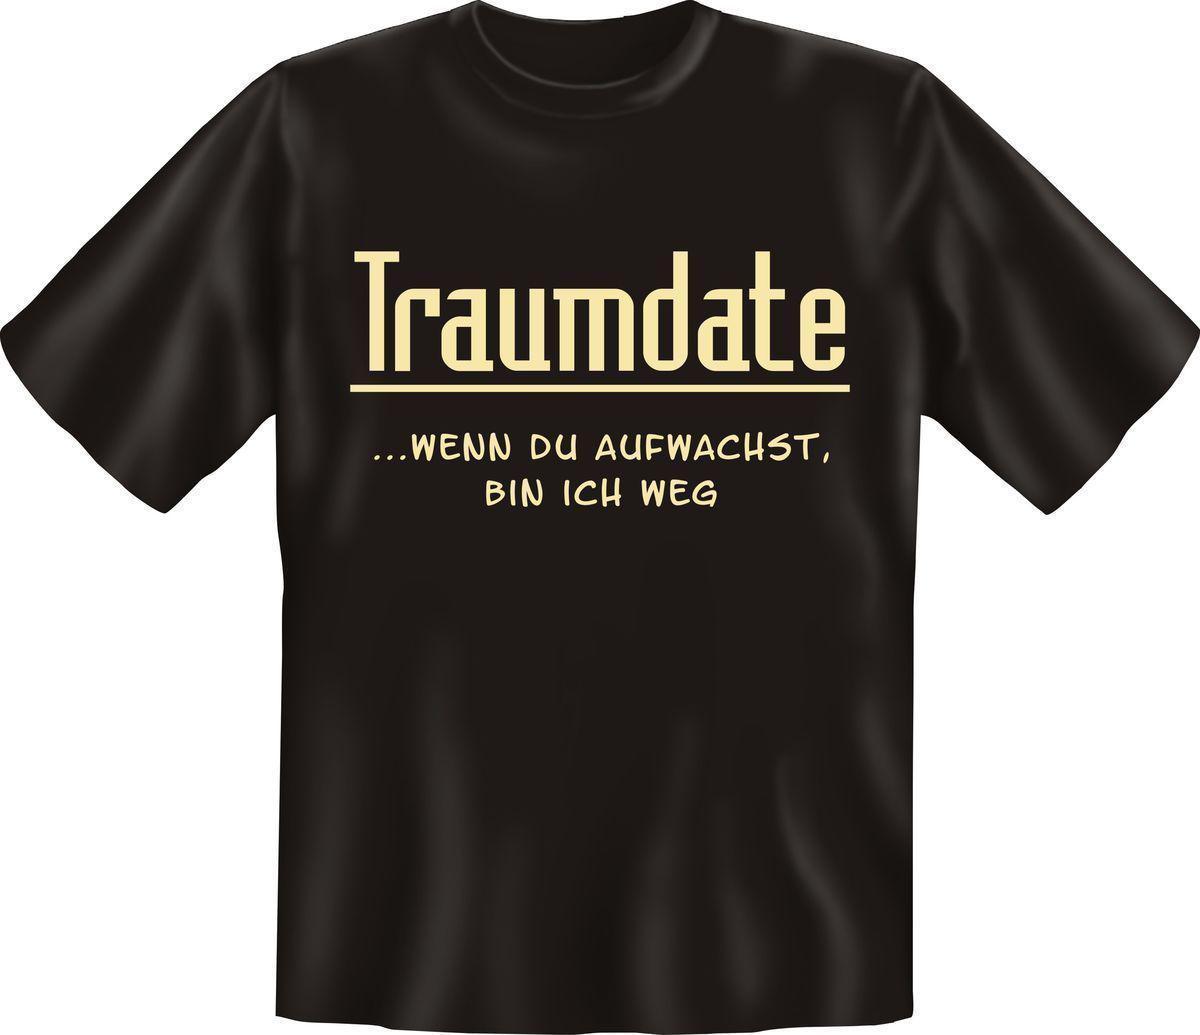 Fun Collection T Shirt coole Macho Sprüche Party Shirt Geschenk